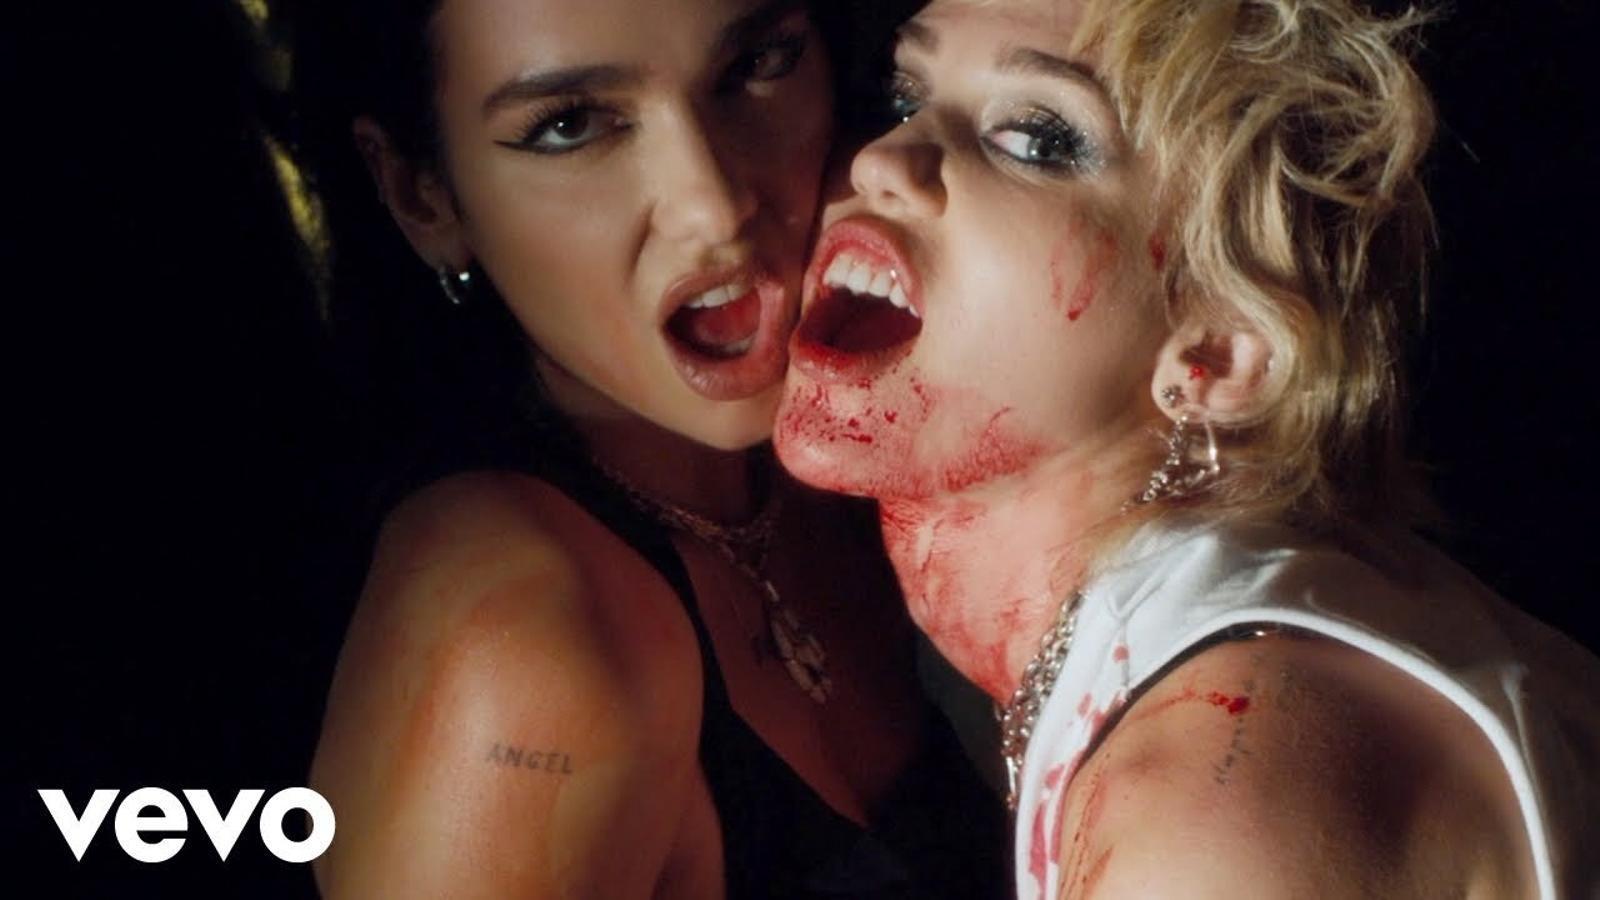 Miley Cyrus & Dua Lipa, 'Prisoner', videoclip